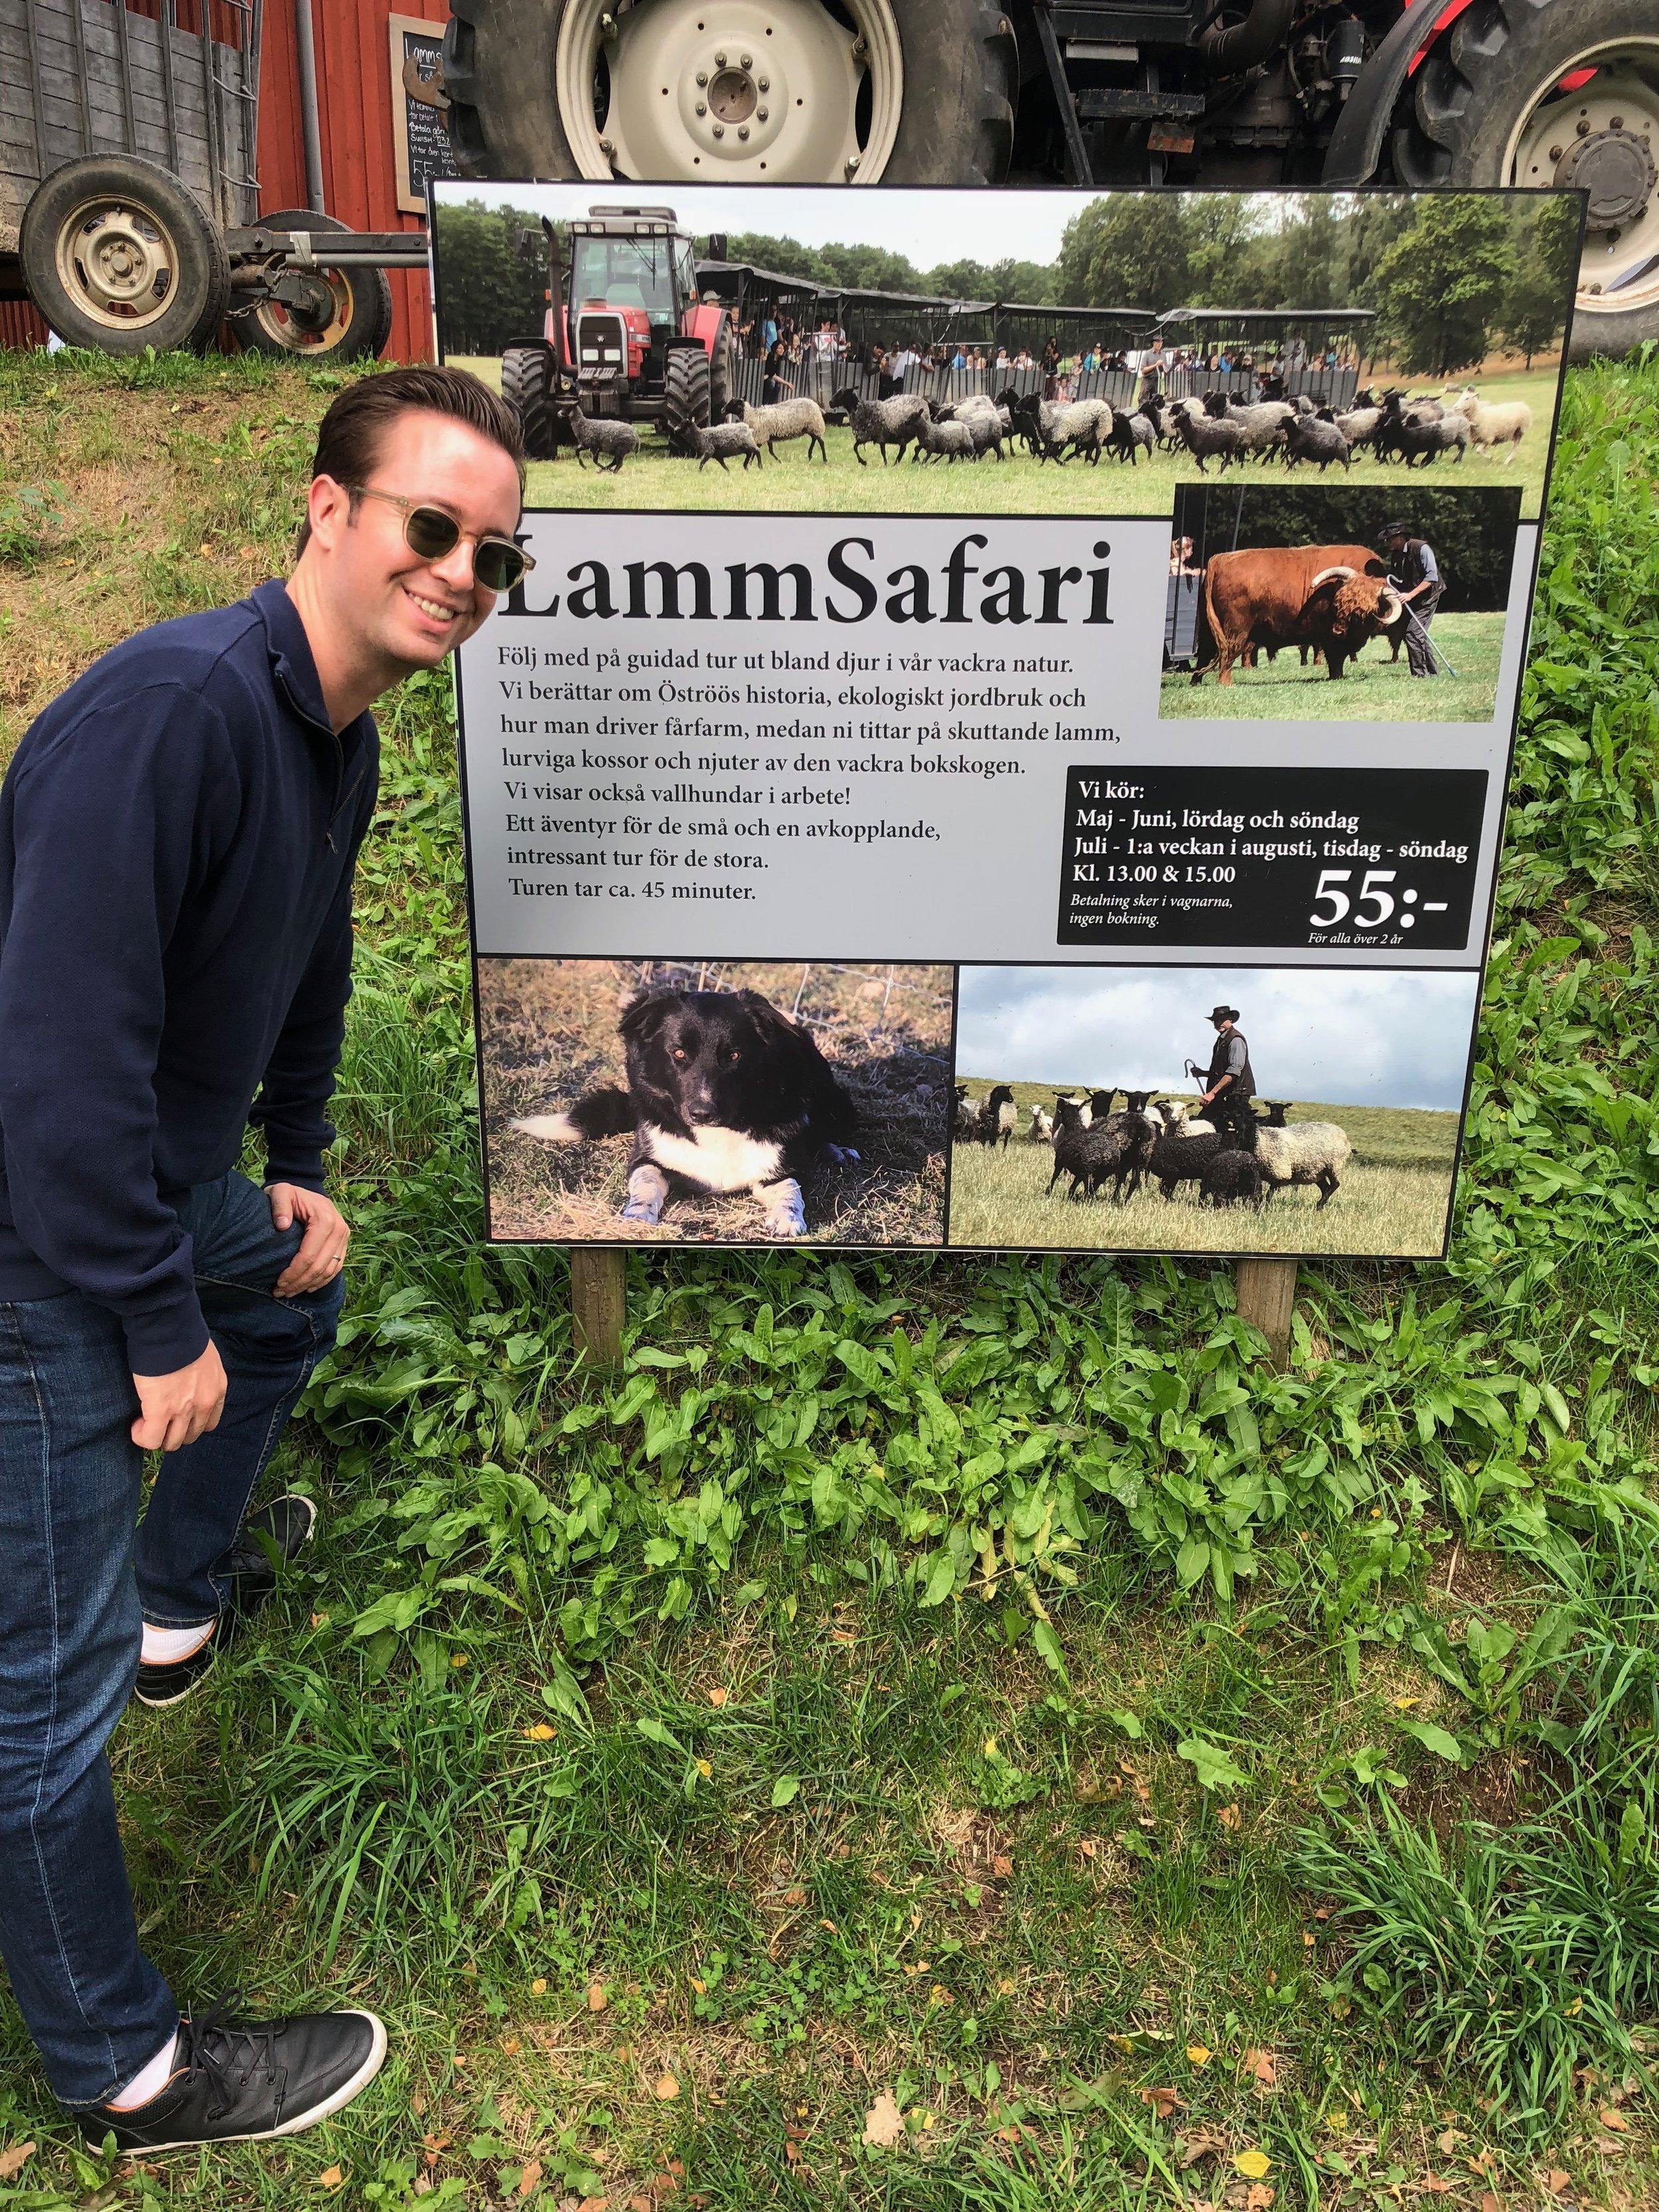 At the farm, you can hop on a lamb safari